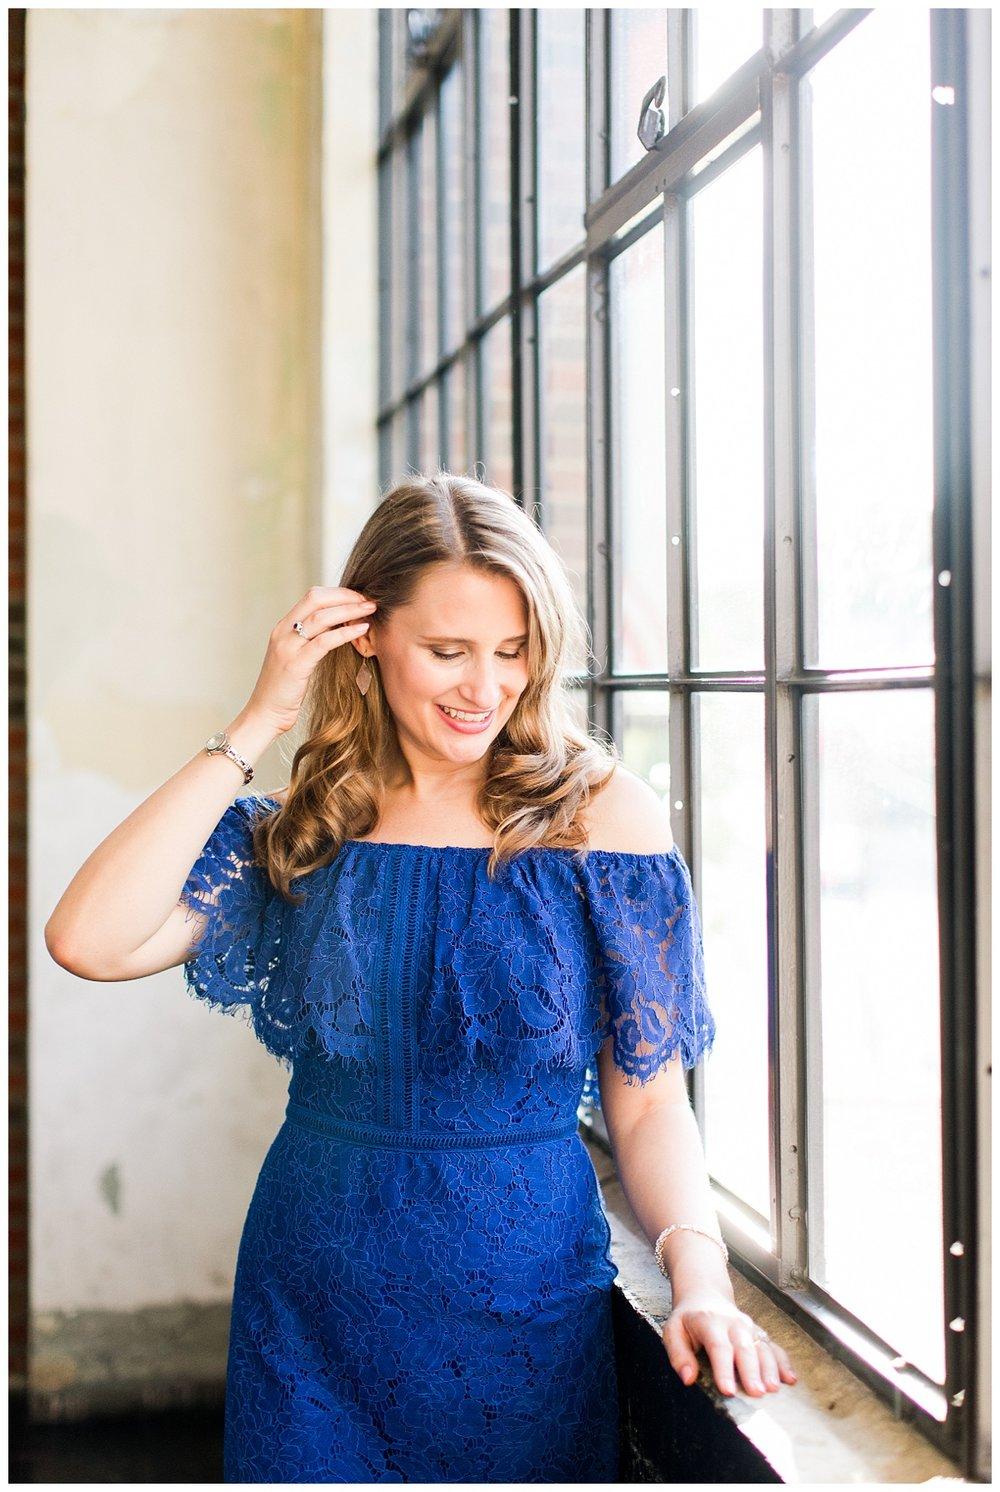 Engagement Pictures_KIm and Hamish_Abby Breaux Photography_Atlanta_Ponce City Market_Jackson Street Bridge_0023.jpg